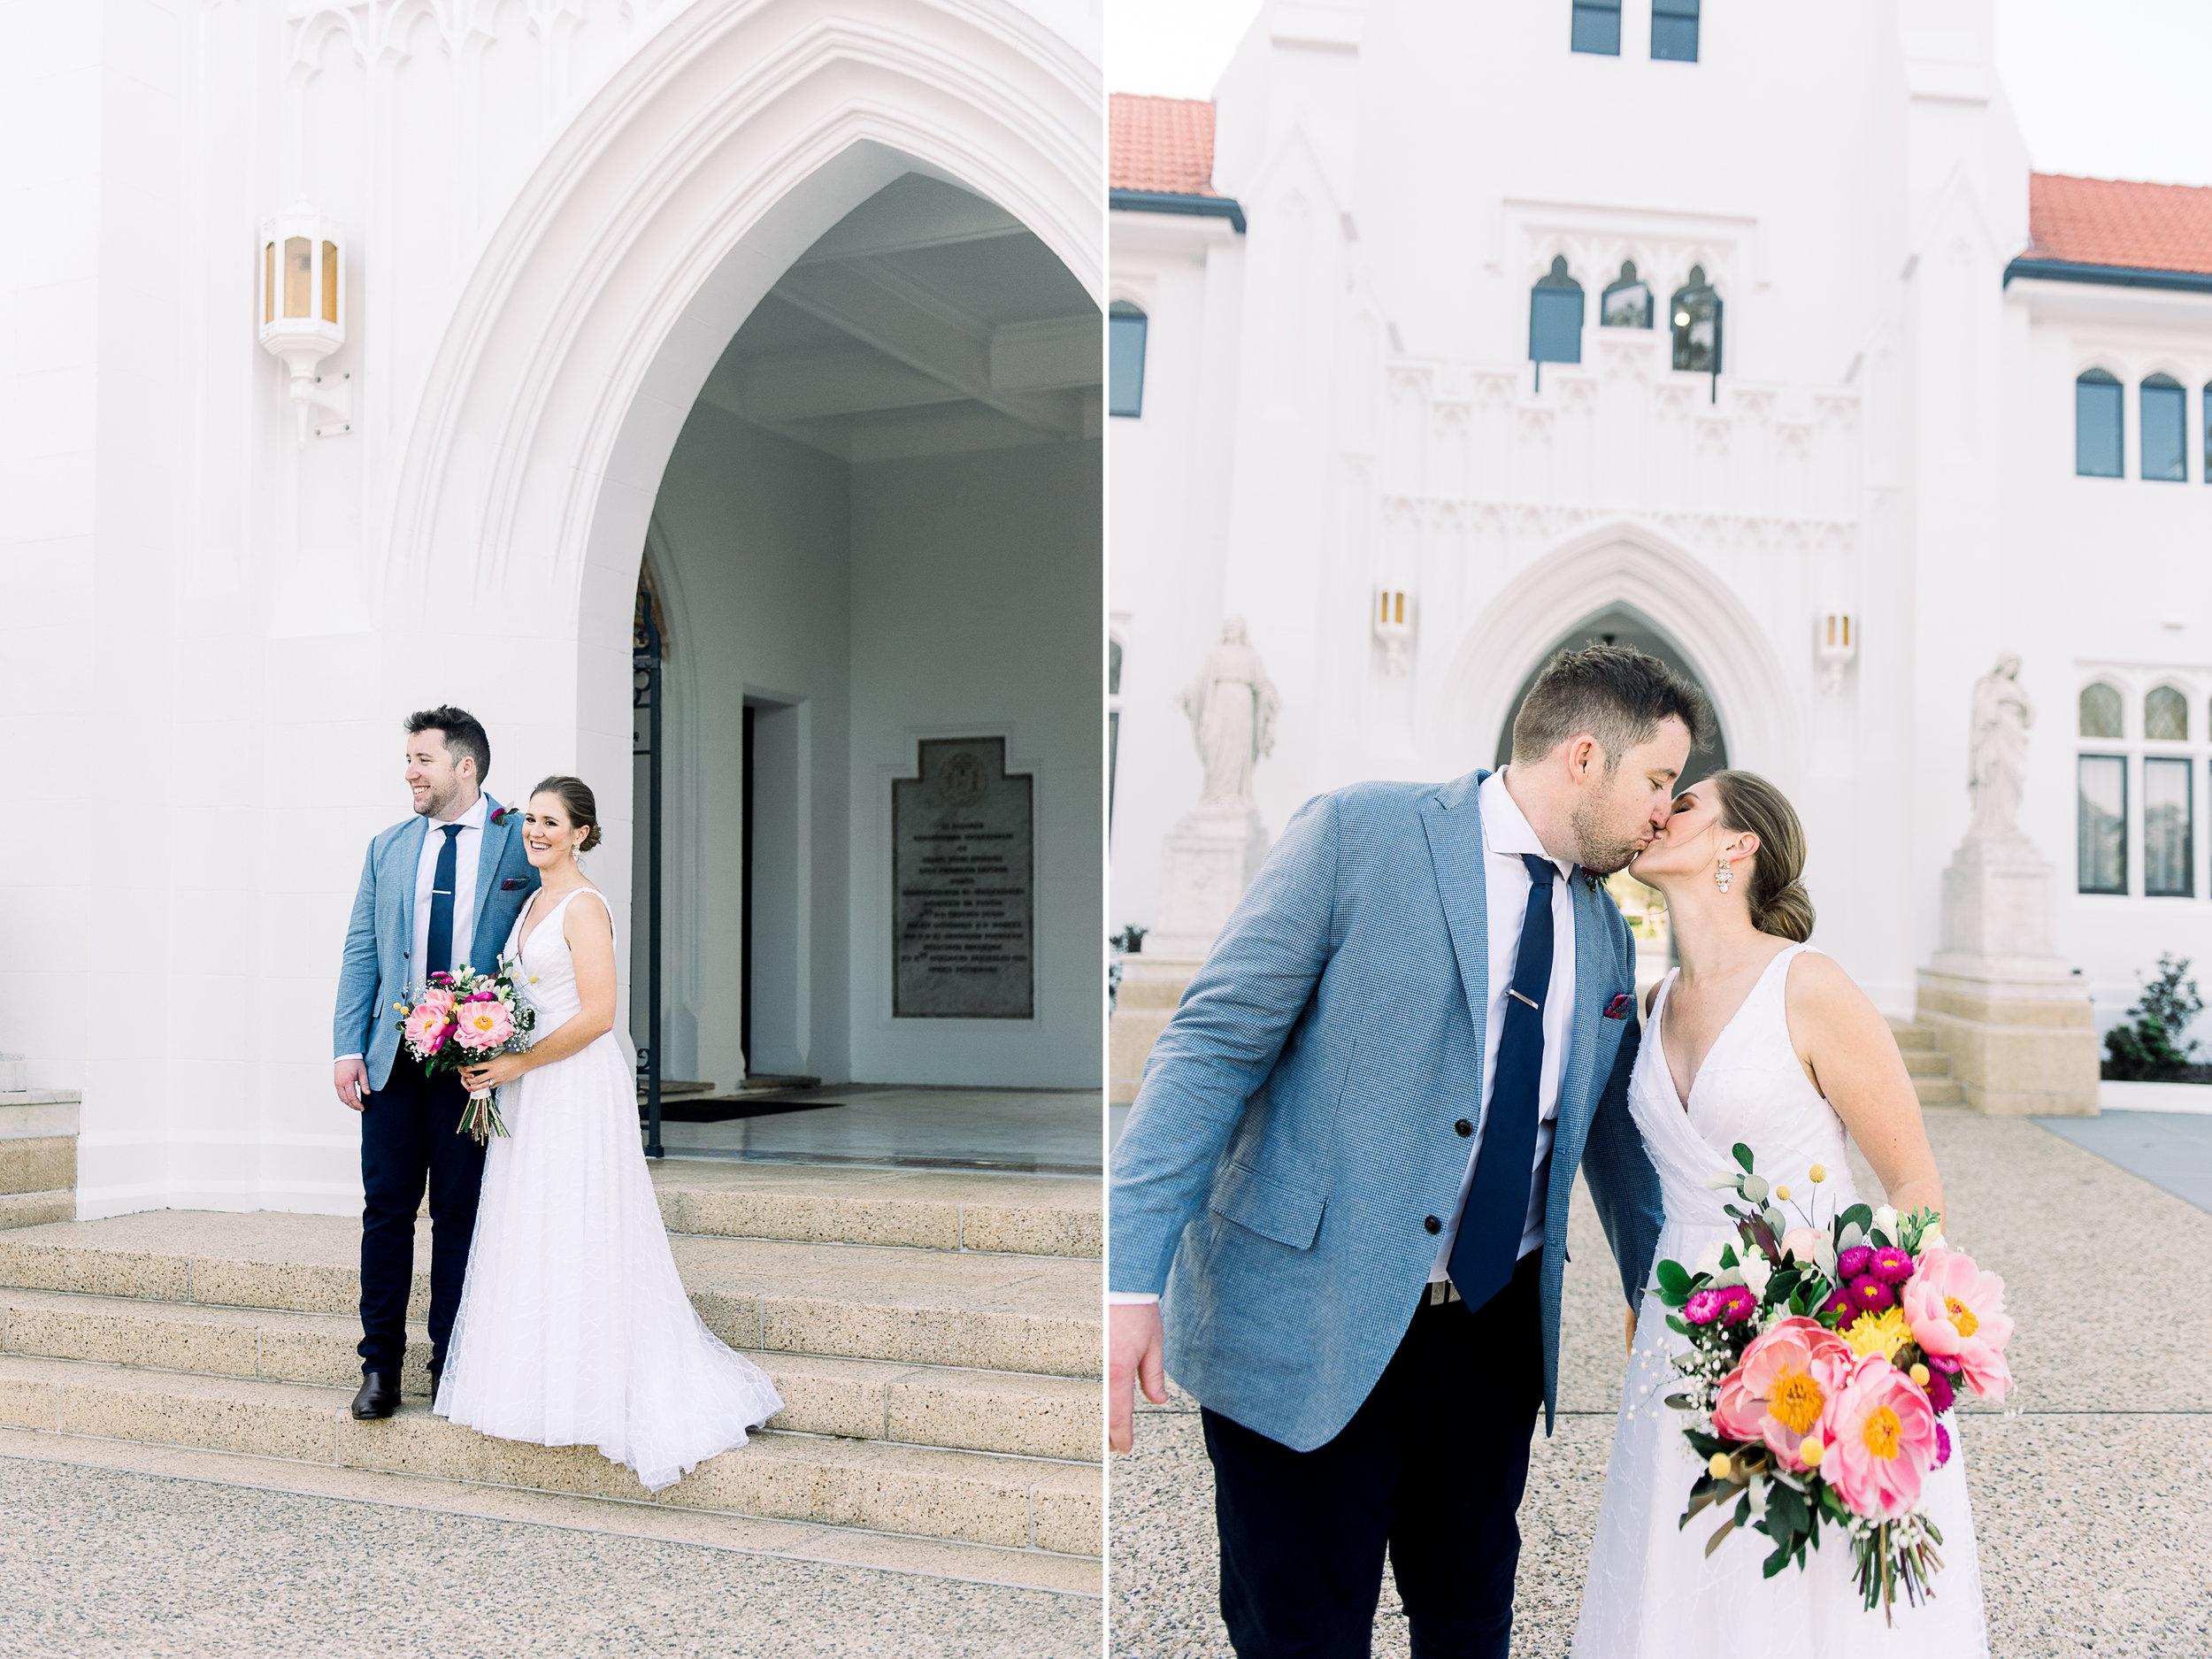 brisbane-city-refinery-wedding-photography-film-21.jpg